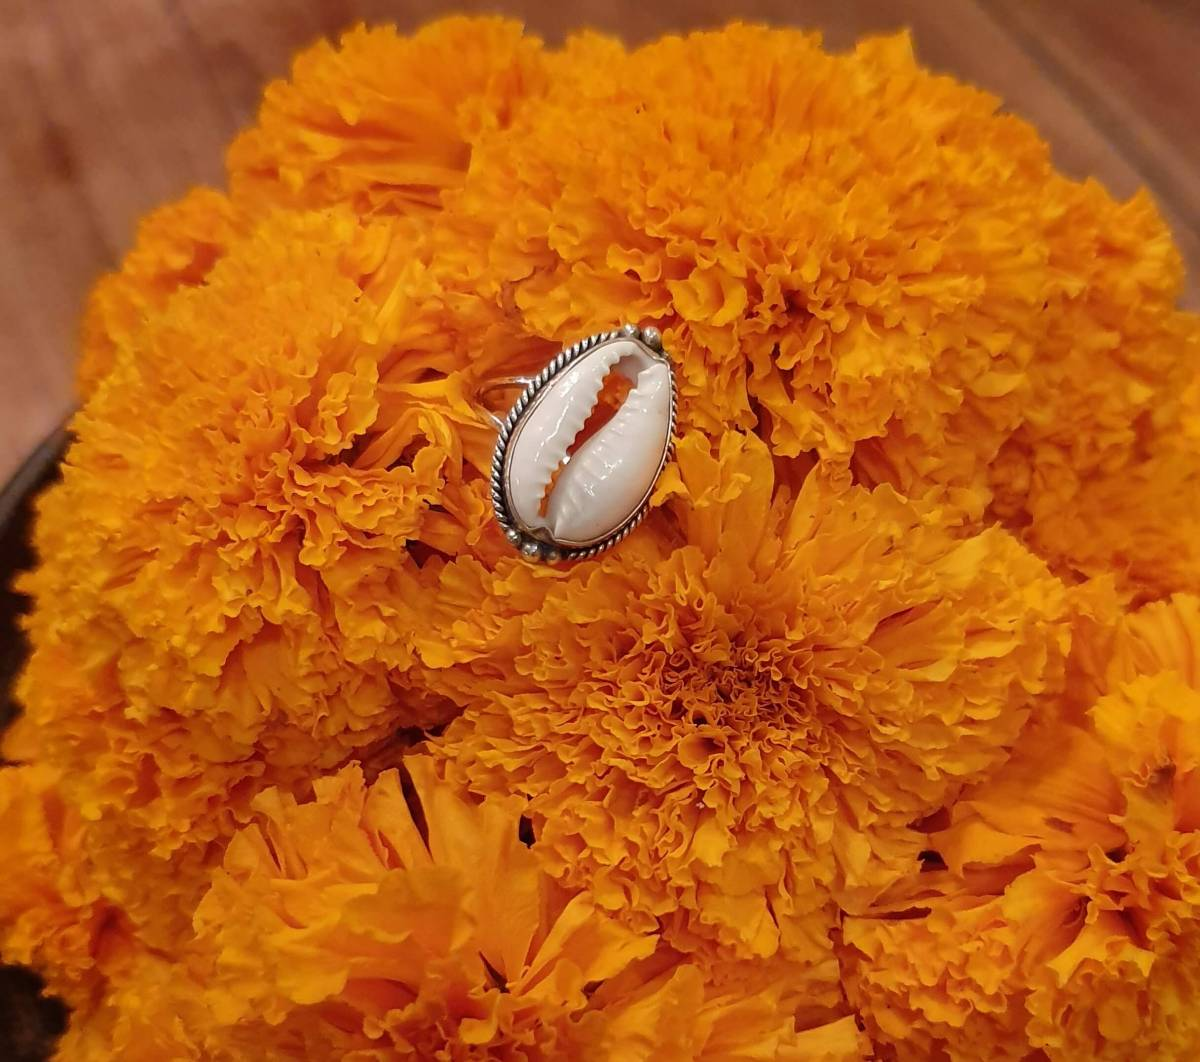 Muschelring Cowrie Muschel Ring 925 Silber aus Bali Boho Silberring Ibiza Style Strand Schmuck